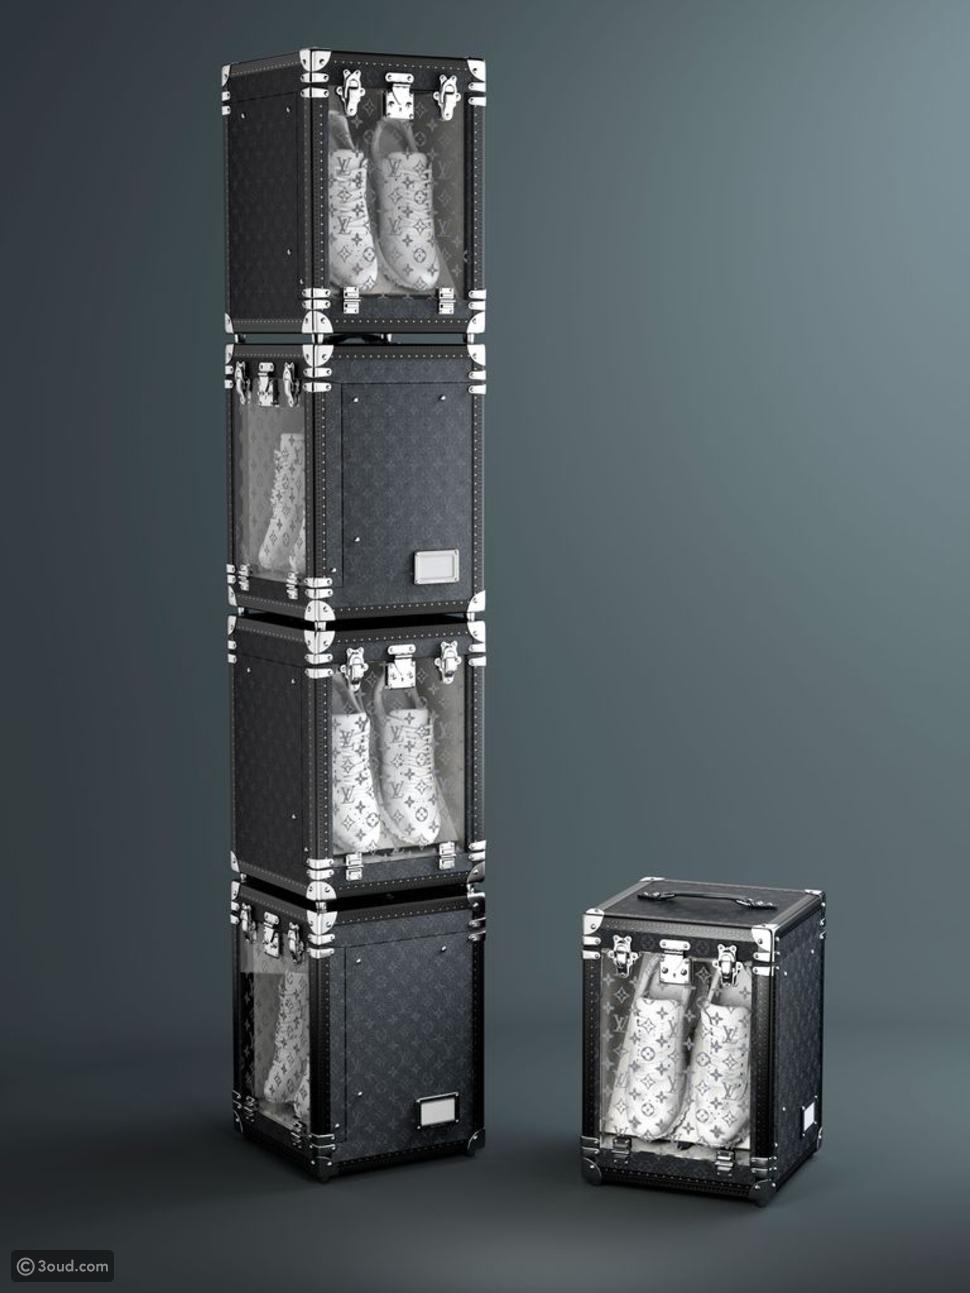 Louis Vuitton يصدر صندوقا أنيقا لحفظ الأحذية الرياضية